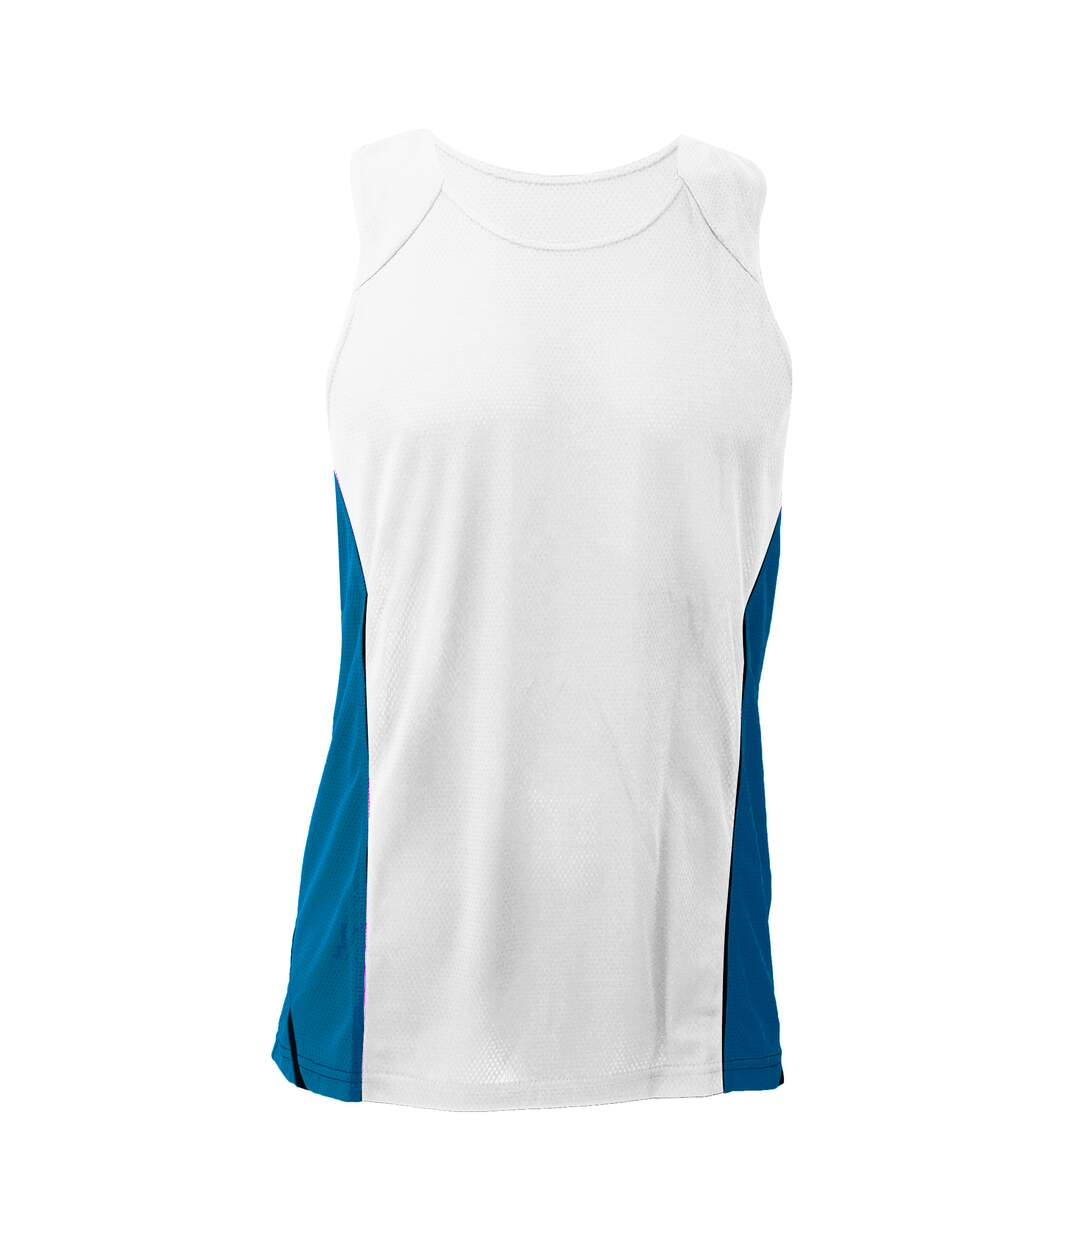 Gamegear® Mens Cooltex® Sports Sleevless Vest Top / Mens Sportswear (Black/Red) - UTBC433